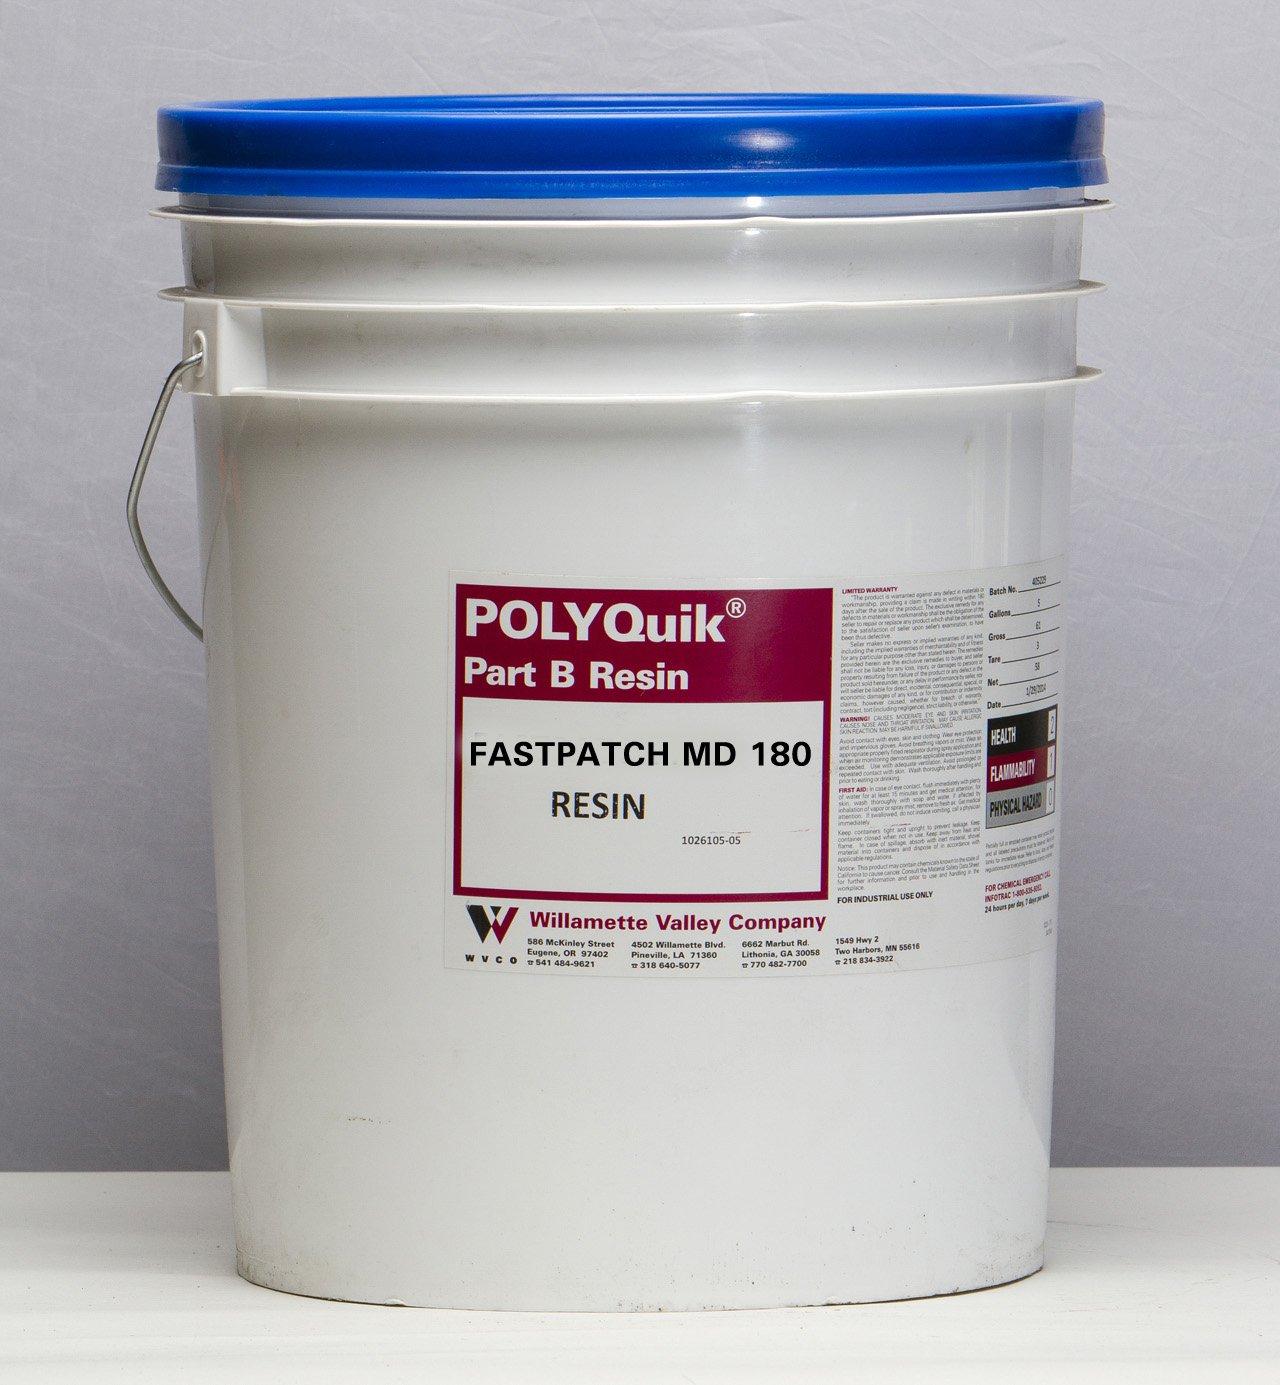 FASTPATCH MD 180 Gray (RESIN) 5-Gal Meter Dispensed Elastomeric Polymer